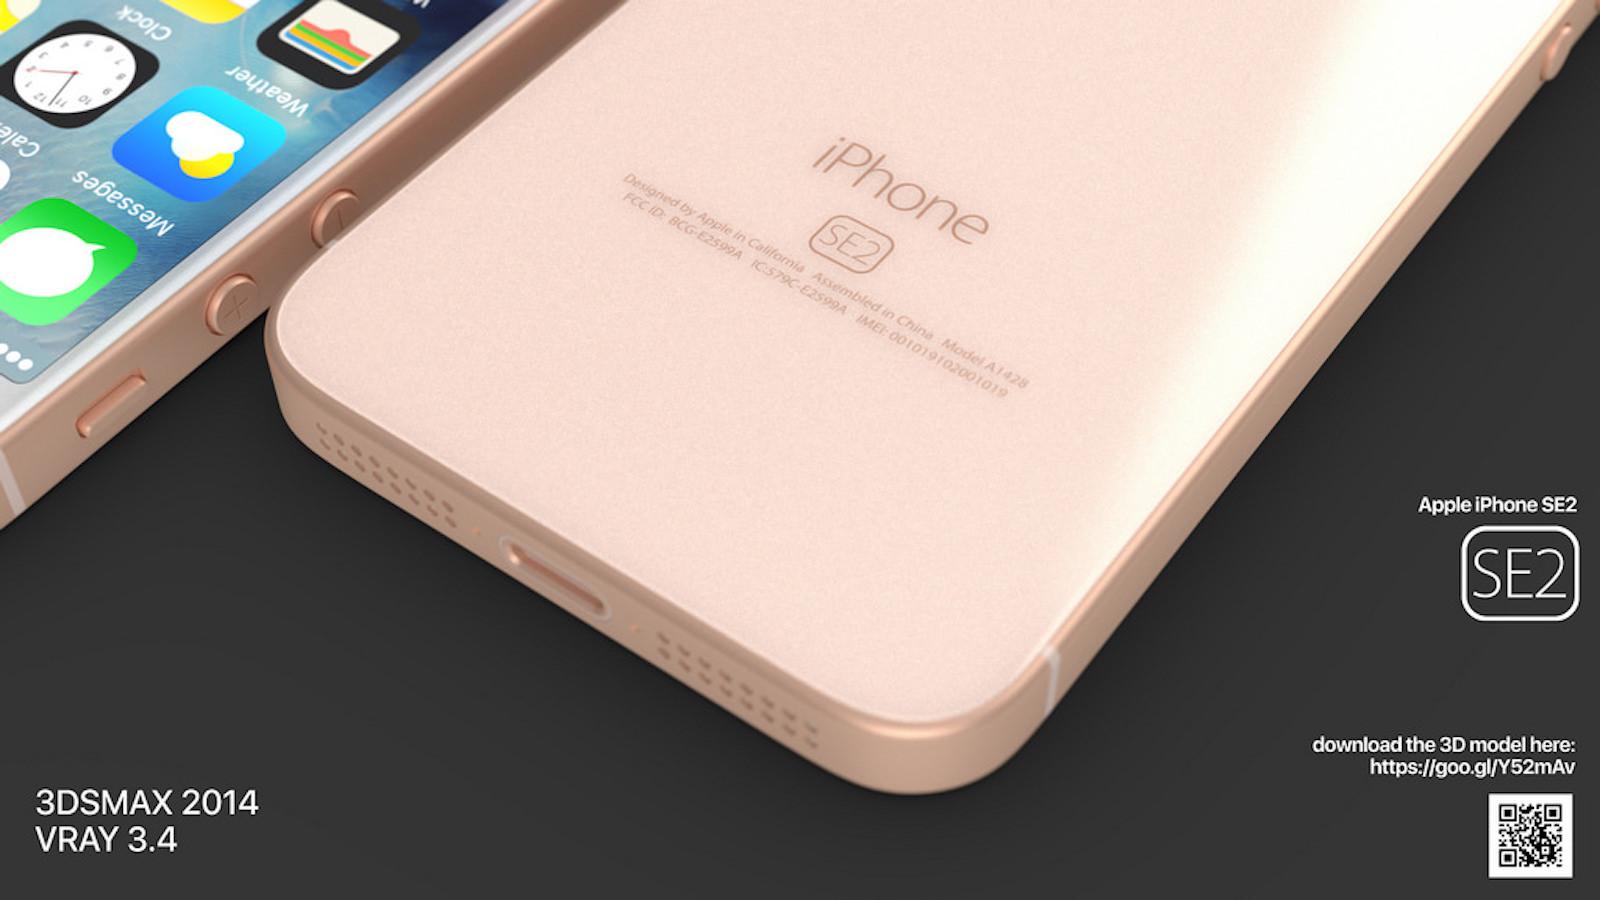 Iphone se2 martin hajek concept image 3